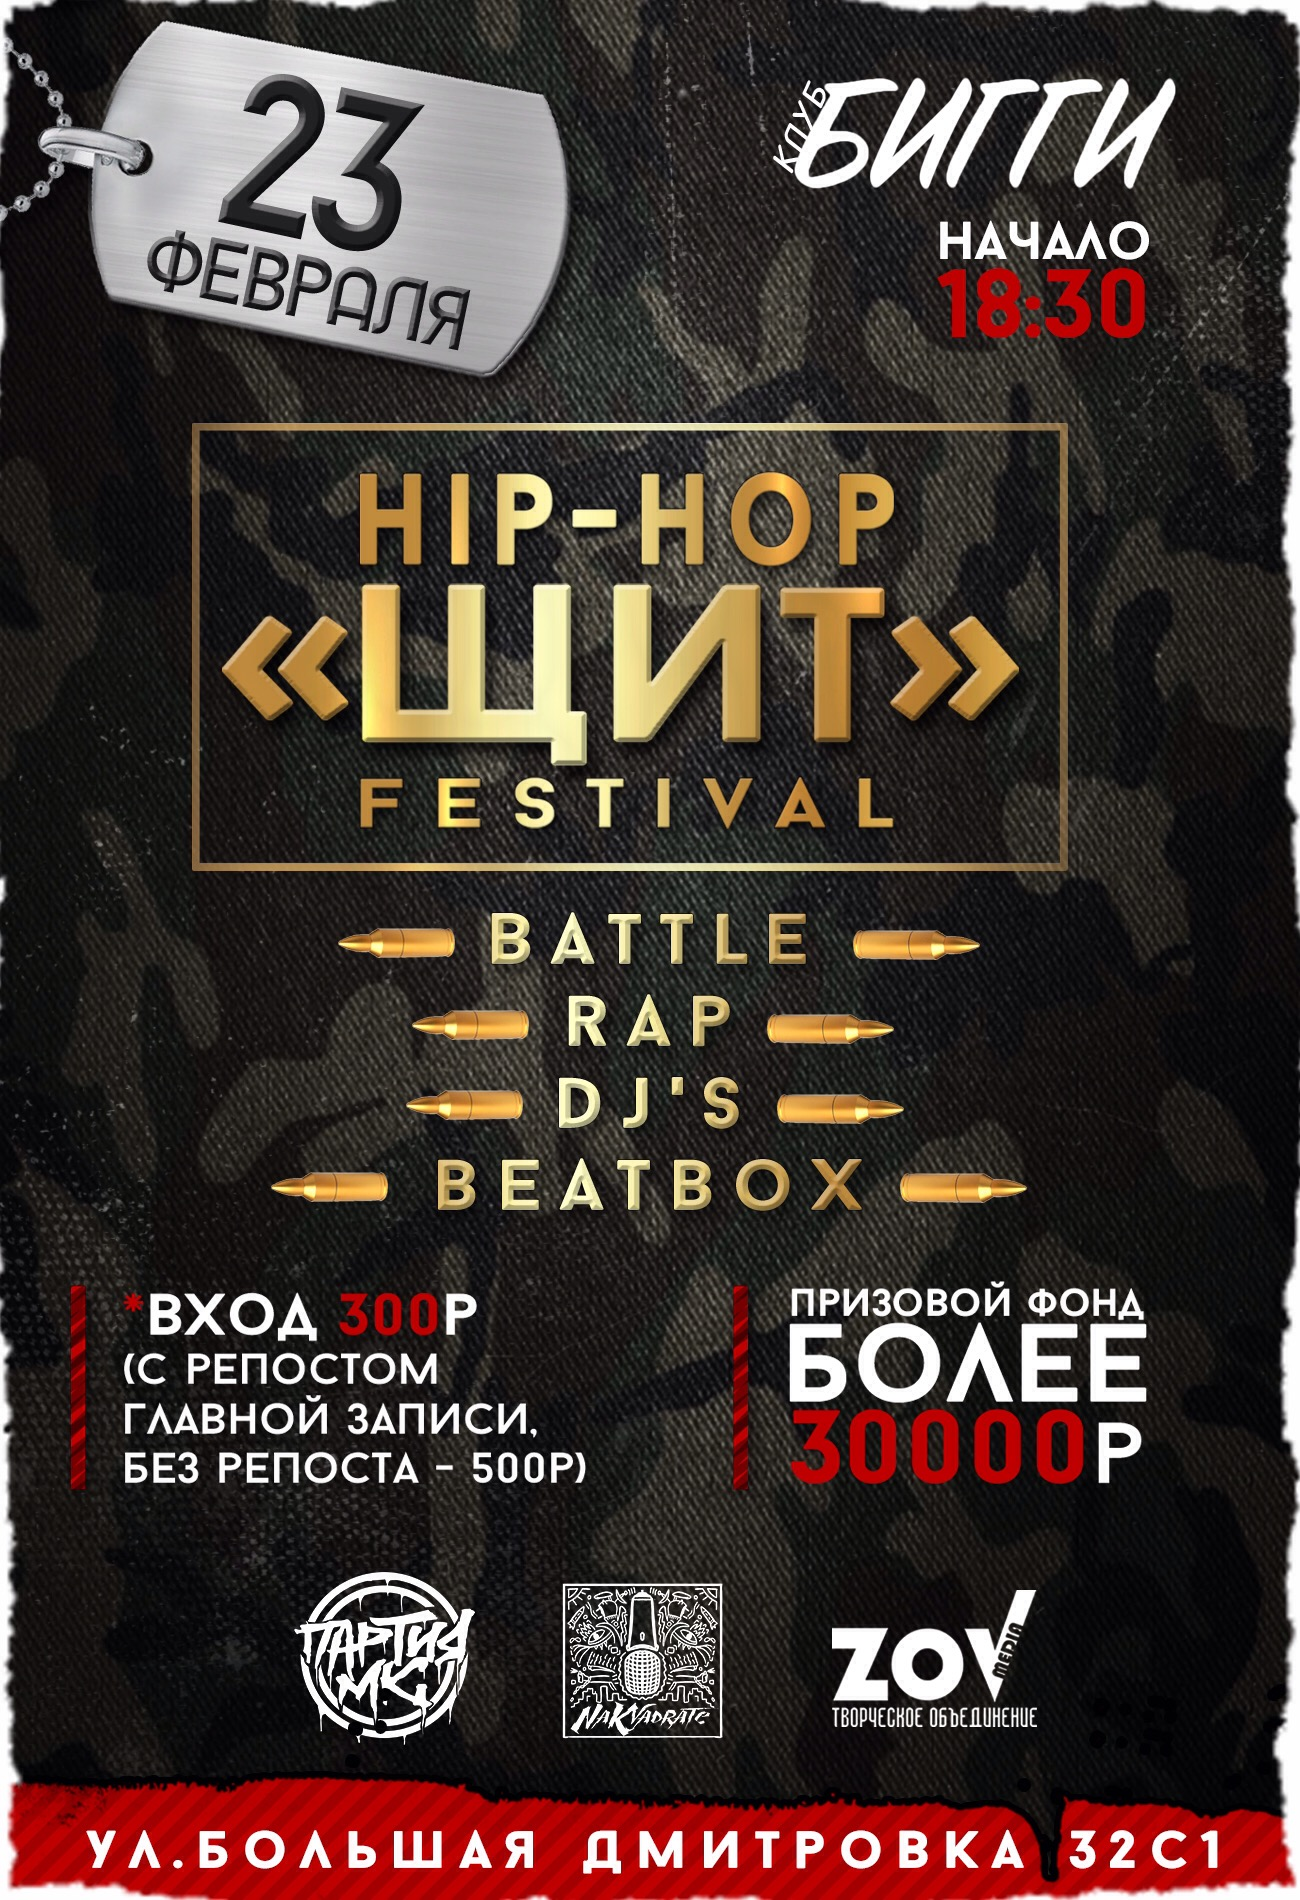 HIP-HOP FESTIVAL ЩИТ